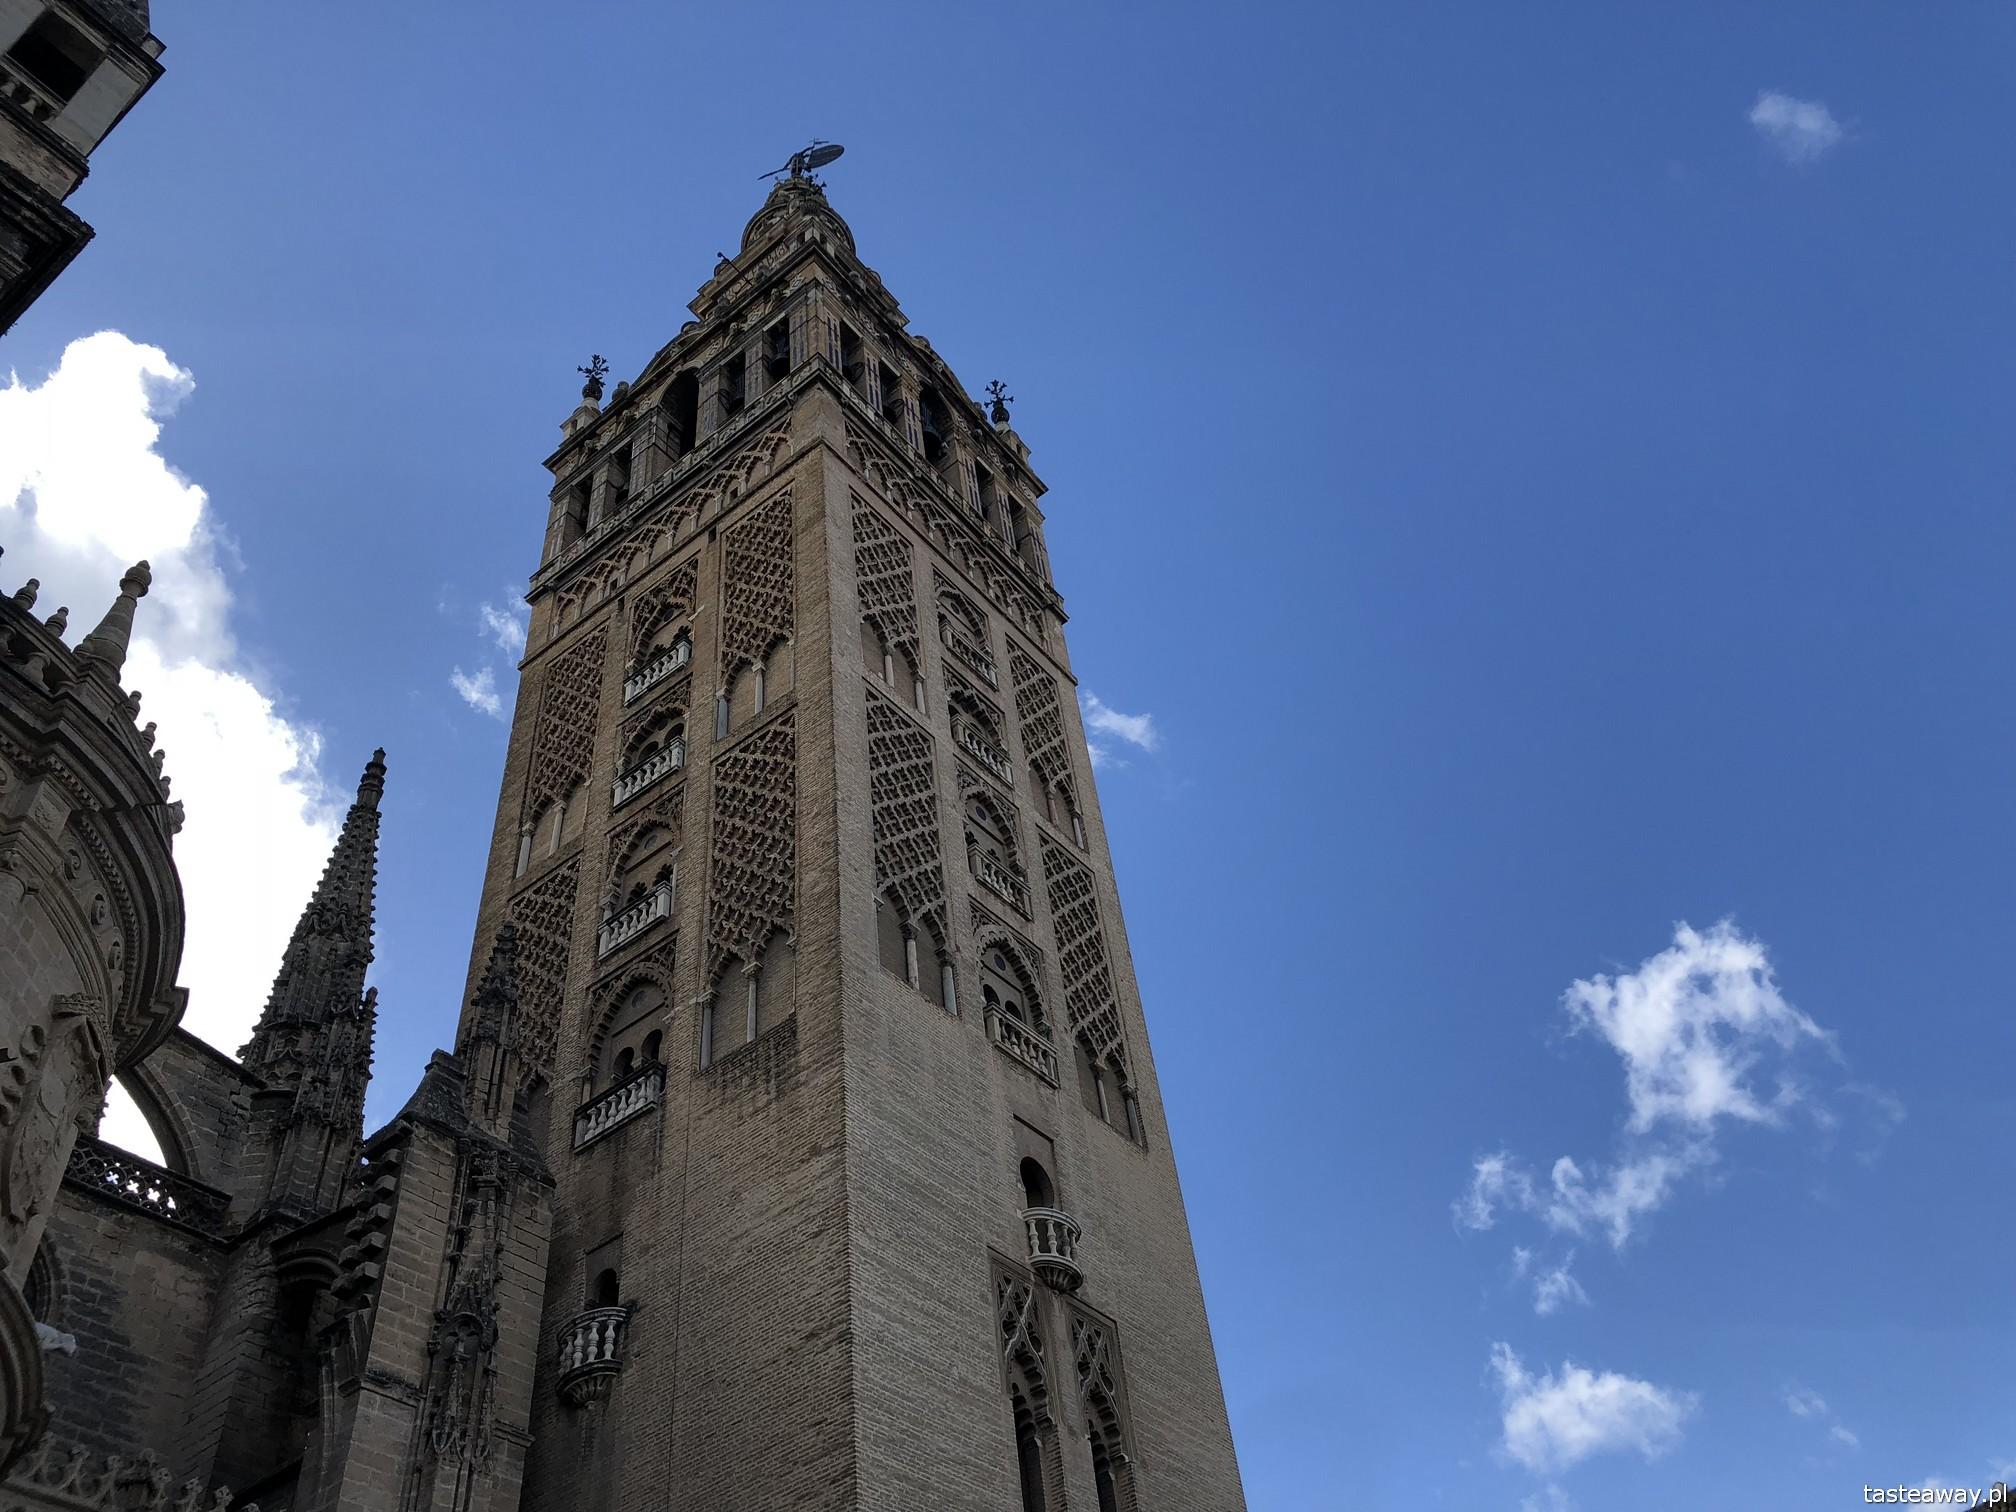 Sewilla, Sevilla, co zobaczyć w Sewilli, Sevilla w jeden dzień, Andaluzja, miasta Hiszpanii, spacer po Sevilli, Torre del Oro, Giralda